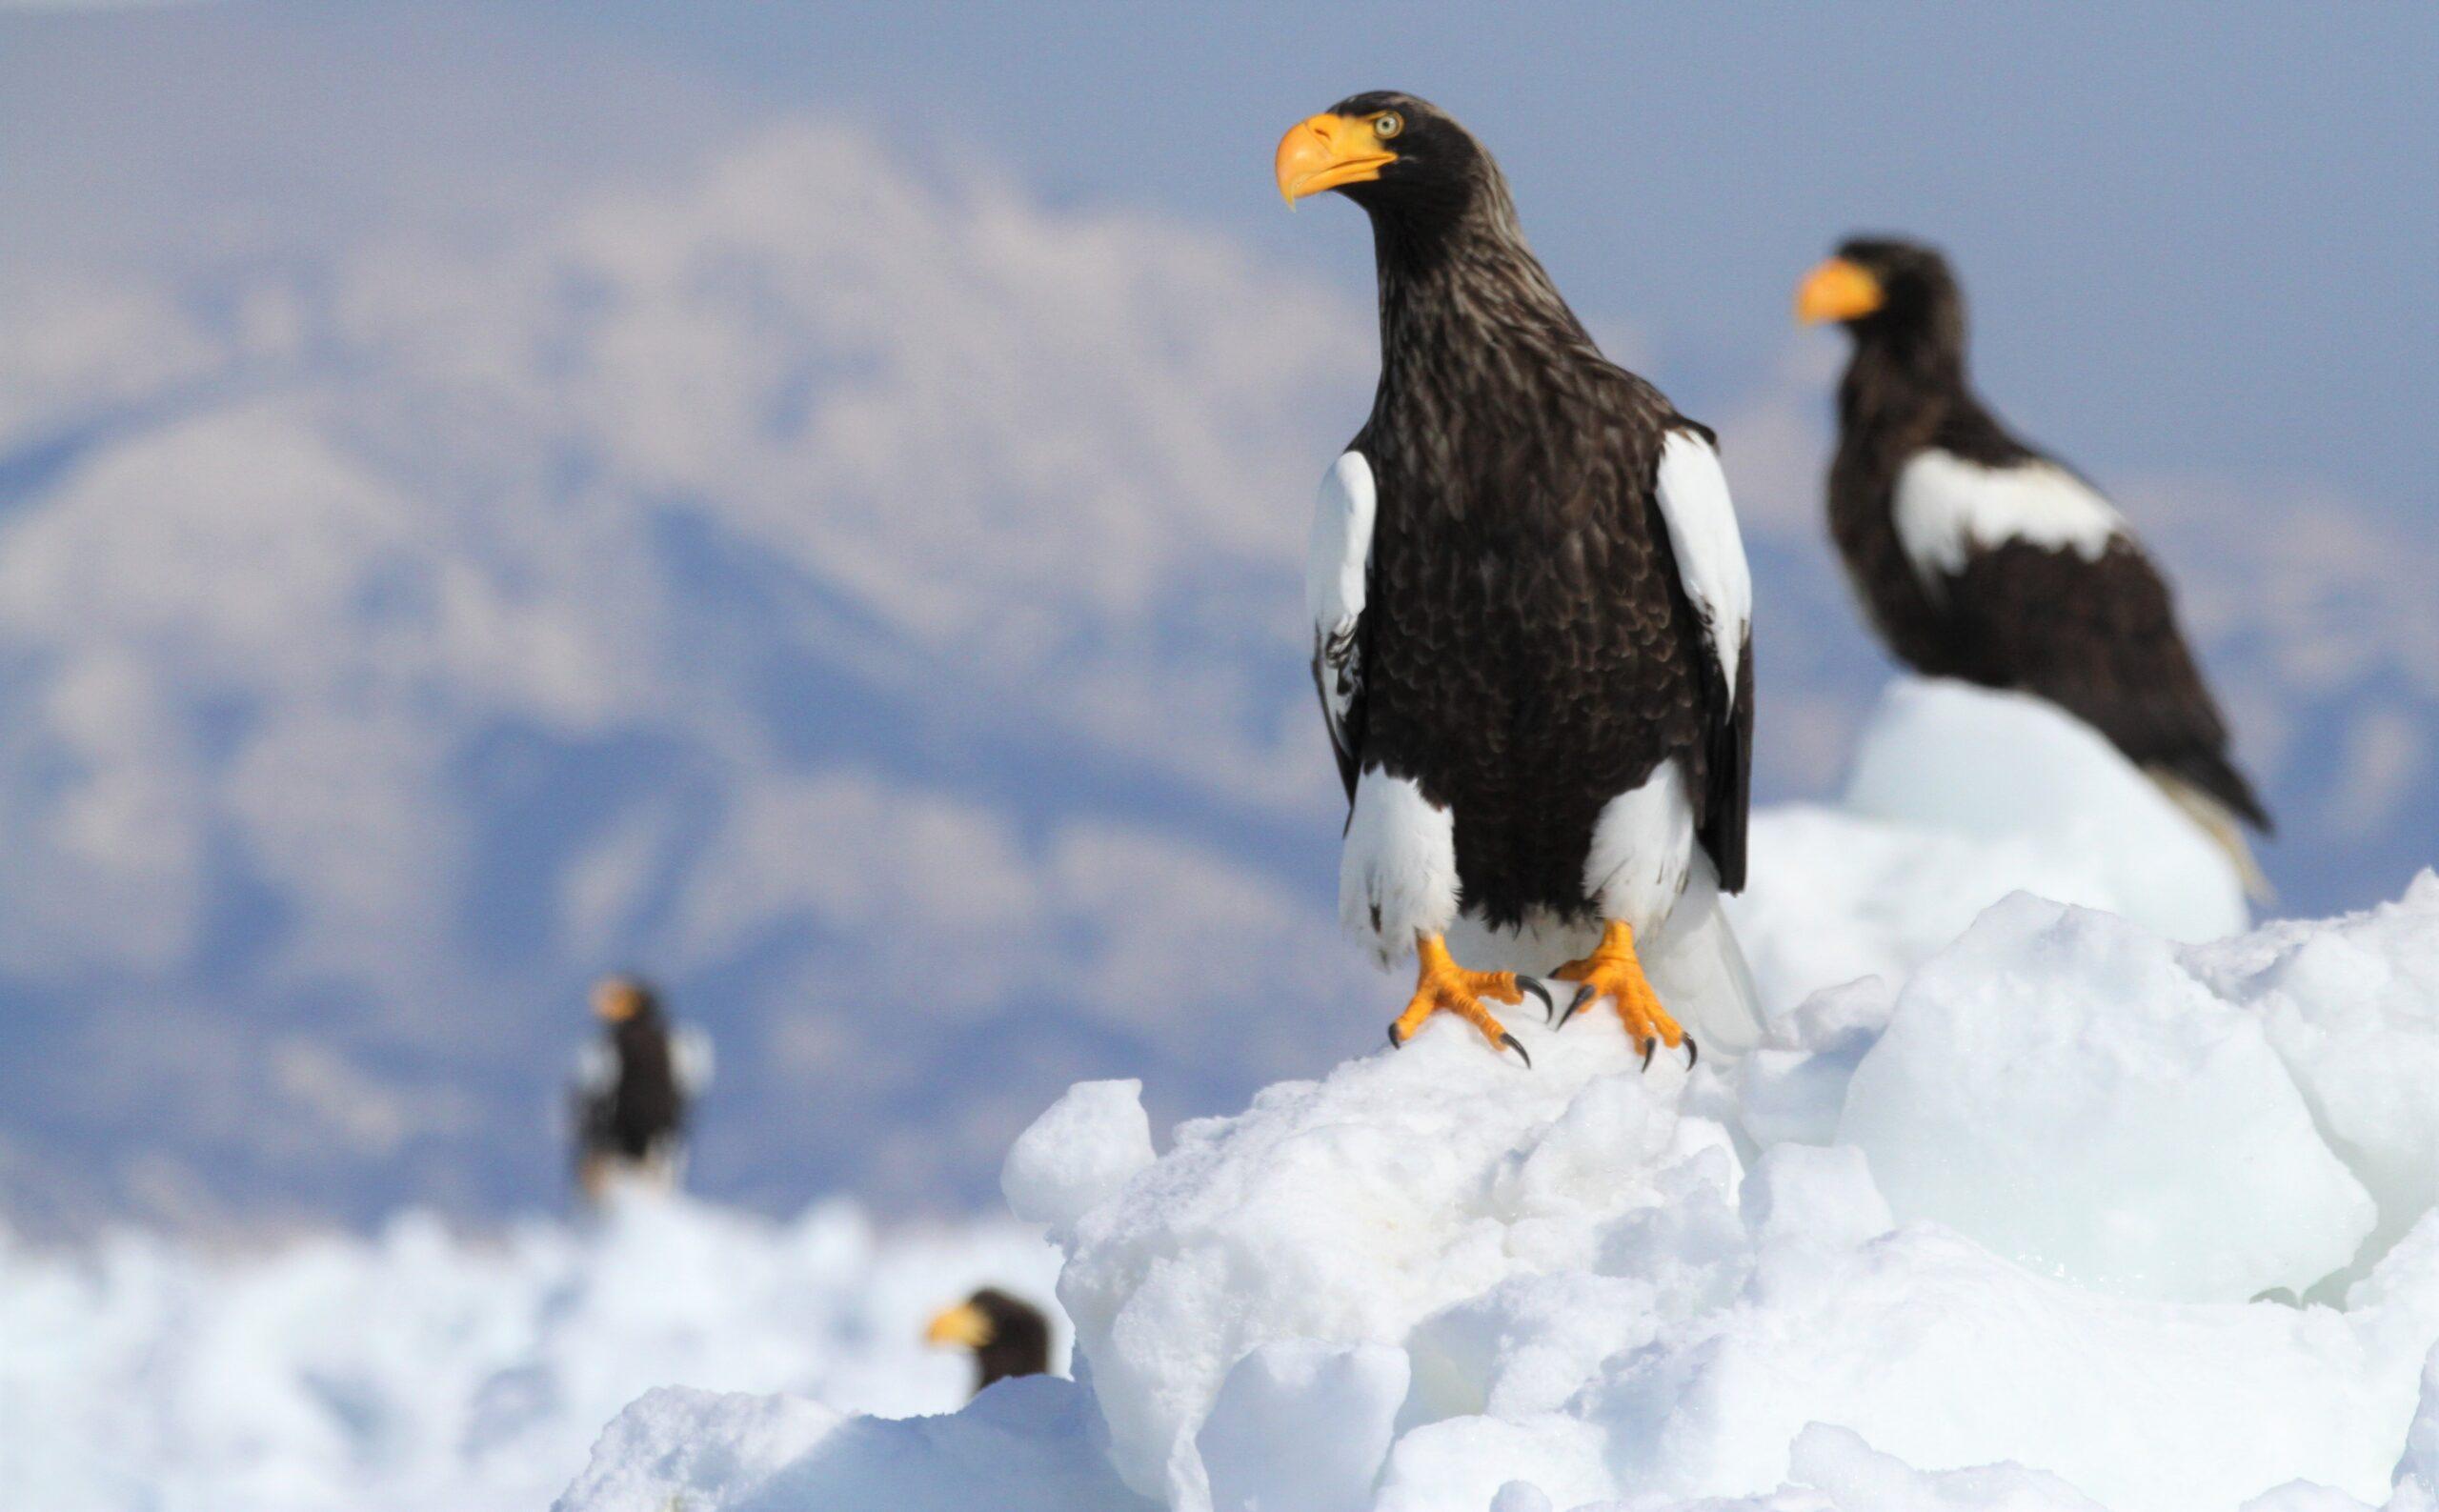 Take a winter Drift Ice and Birdwatching Cruise in Rausu, East Hokkaido